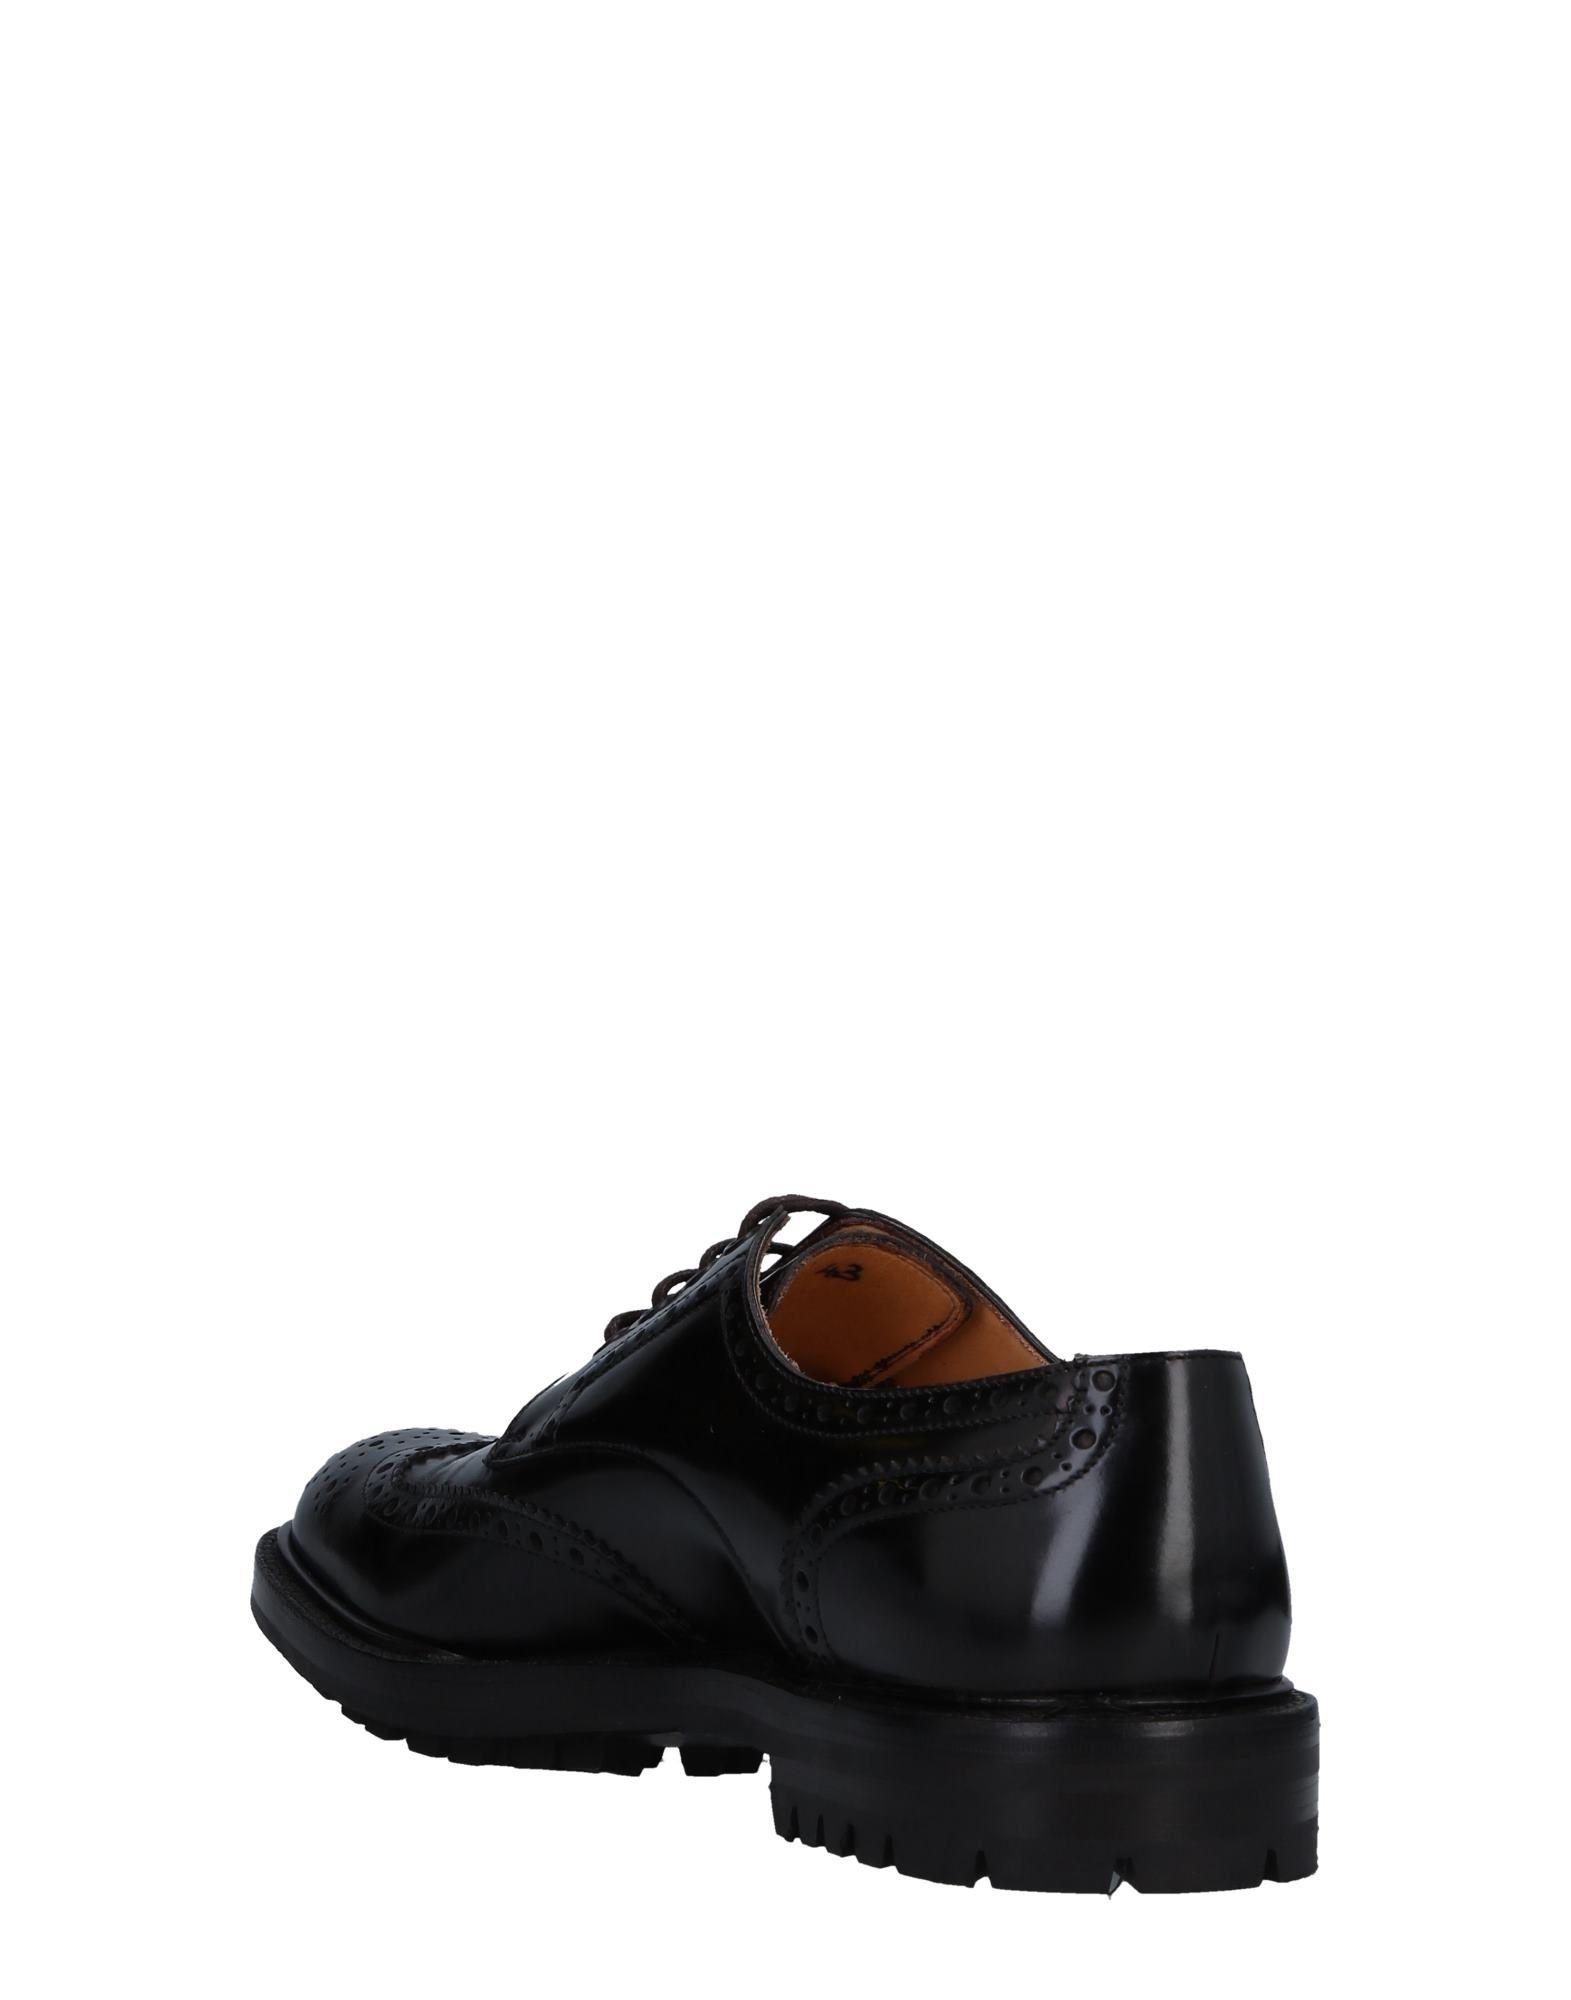 Rabatt echte Schuhe 11515378RT Ortigni Schnürschuhe Herren  11515378RT Schuhe 3e7af8